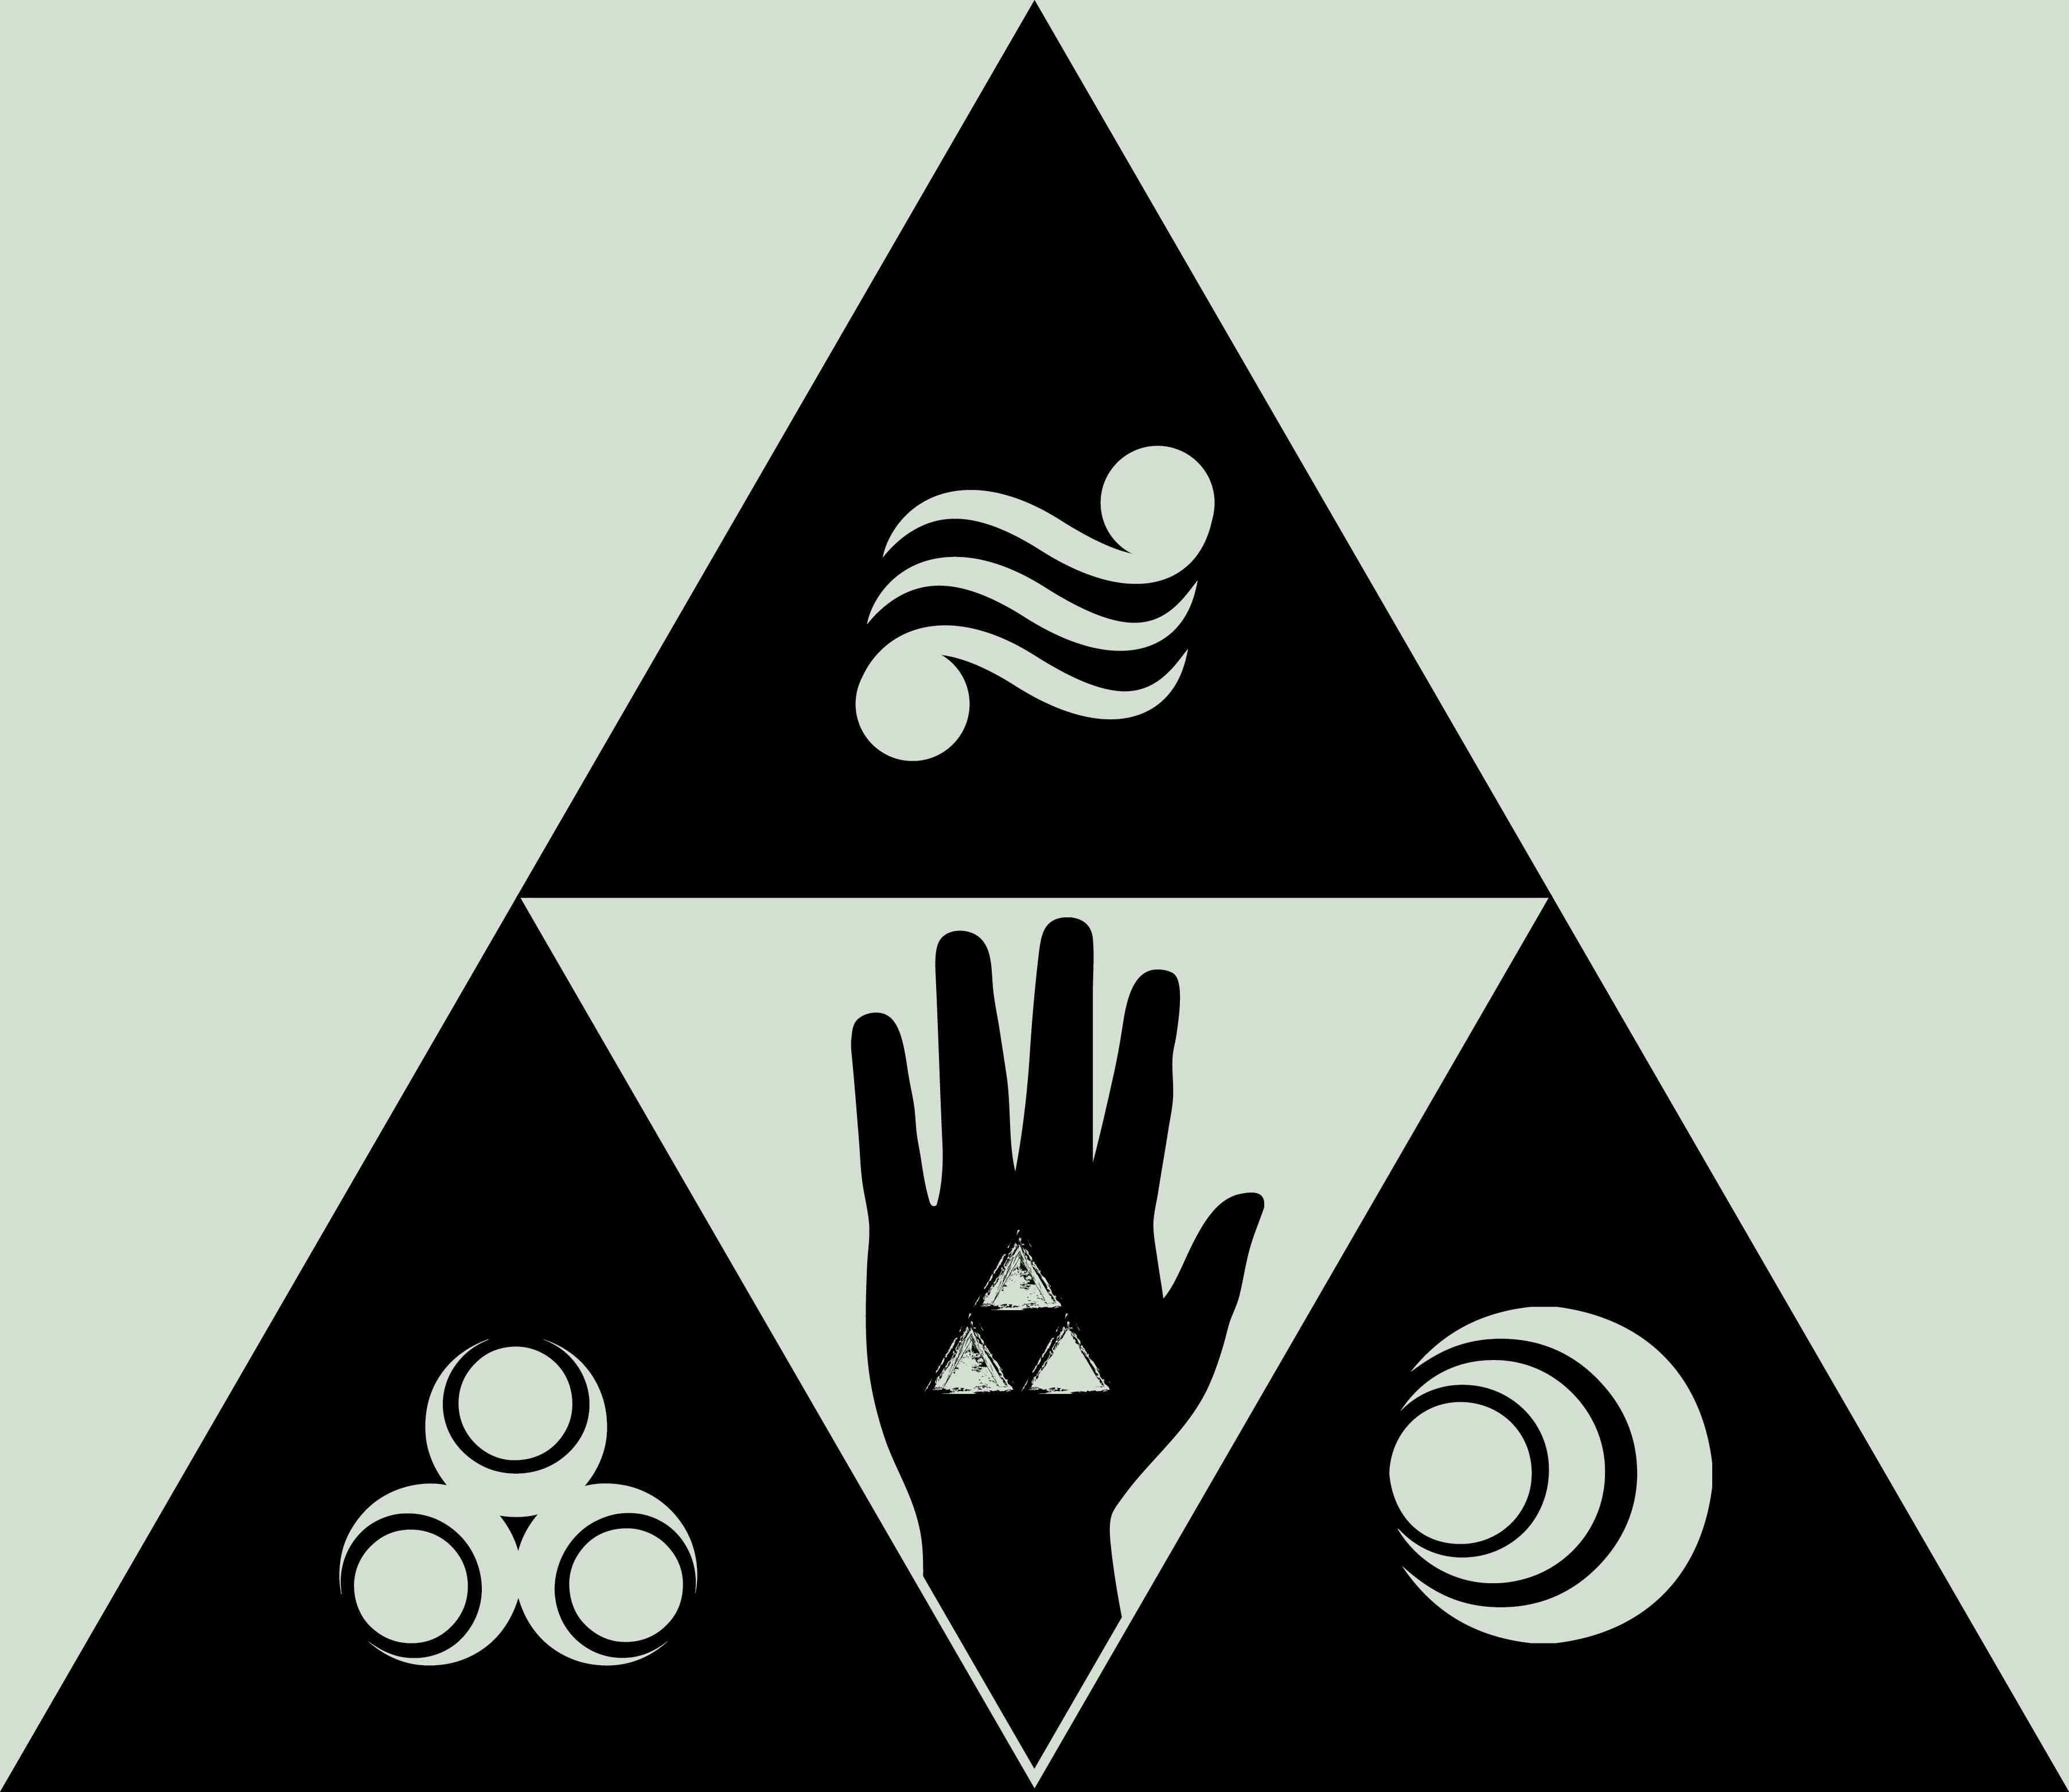 Zelda Iconography by SirNosh on DeviantArt